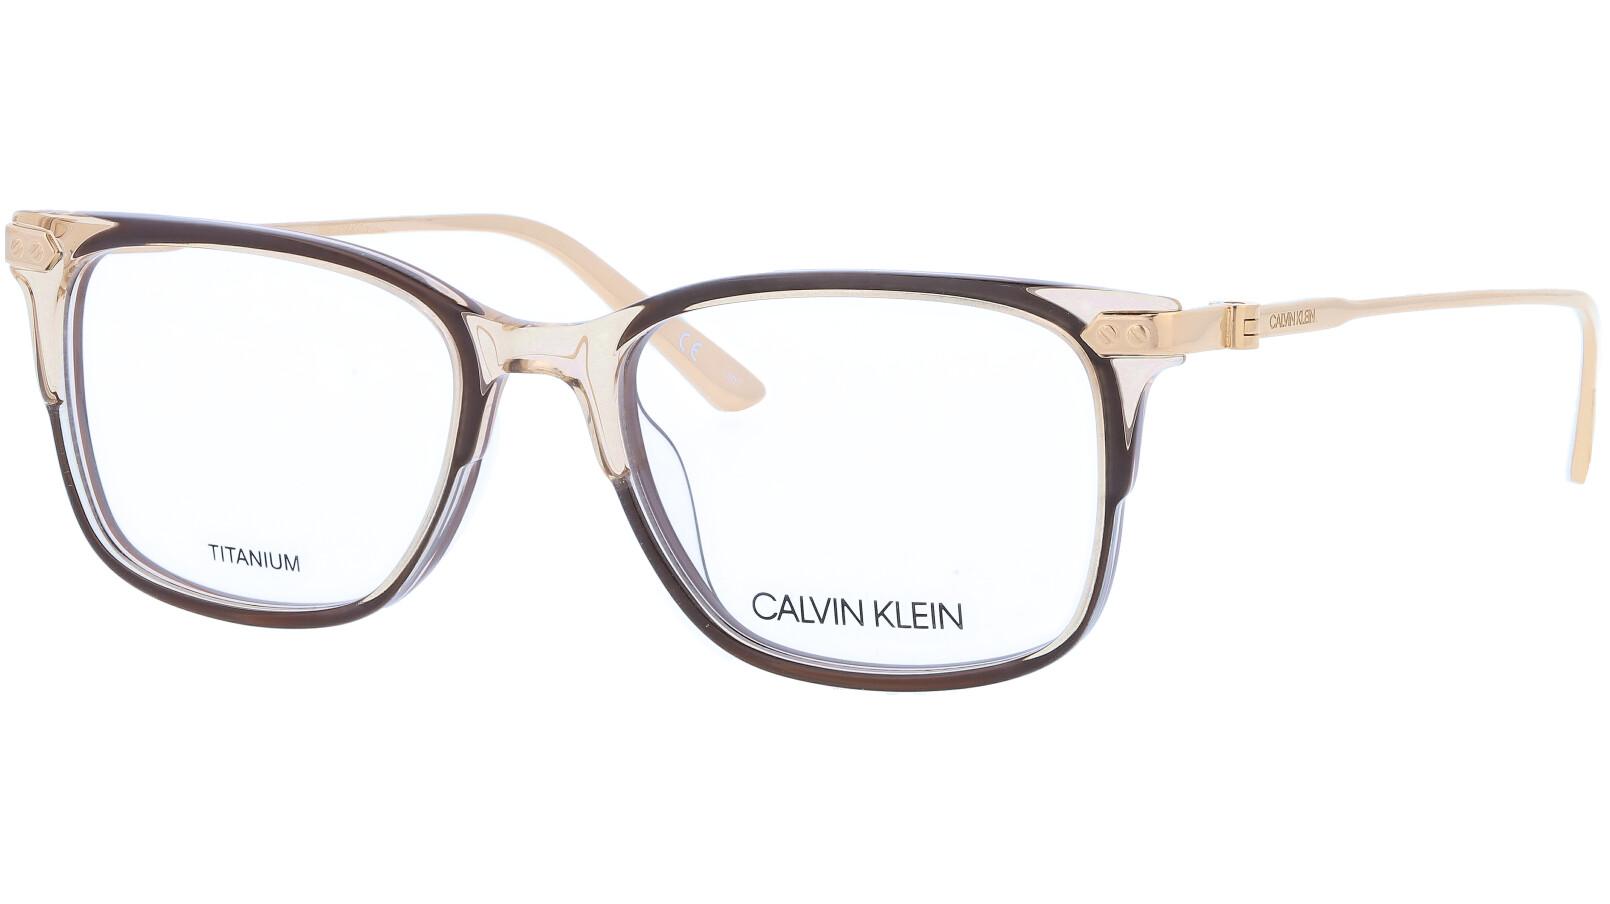 CALVIN KLEIN CK18704 272 51 CRYSTAL BEIGE Glasses